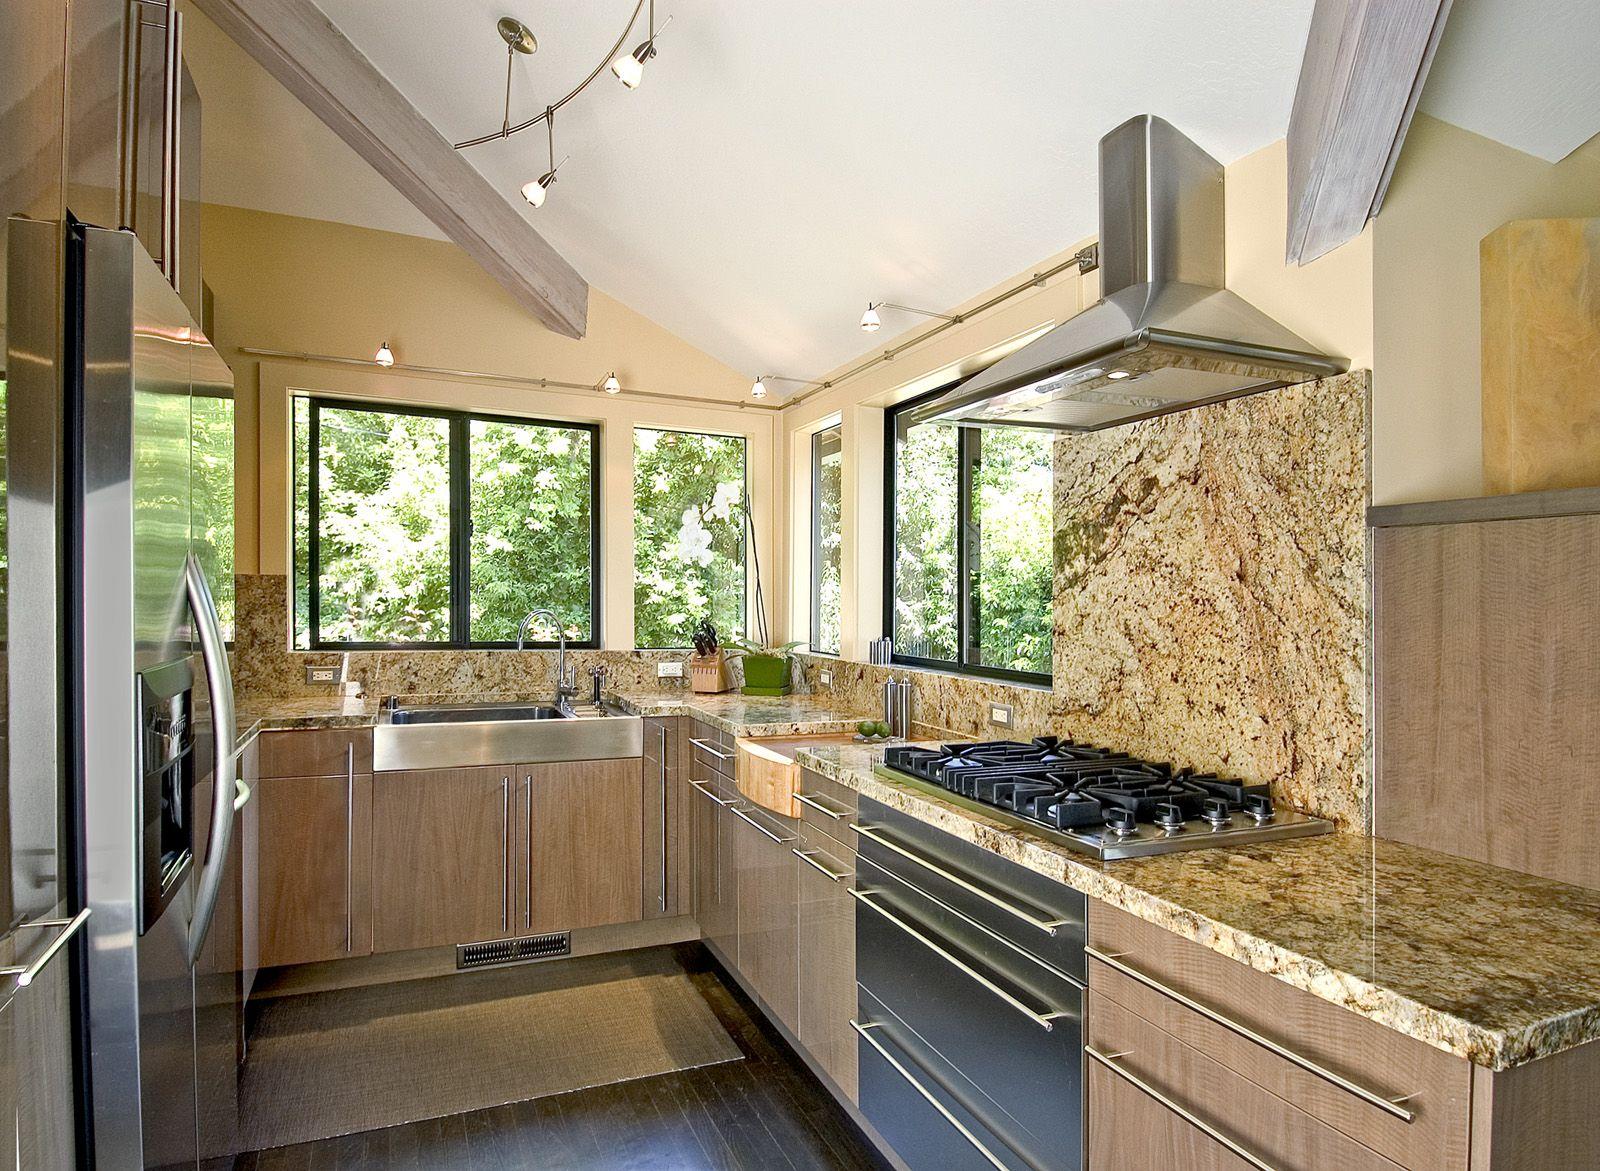 Kuchnia Otwarta Czy Zamknieta Szukaj W Google Modern Kitchen Design Modern Kitchen Granite Kitchen Design